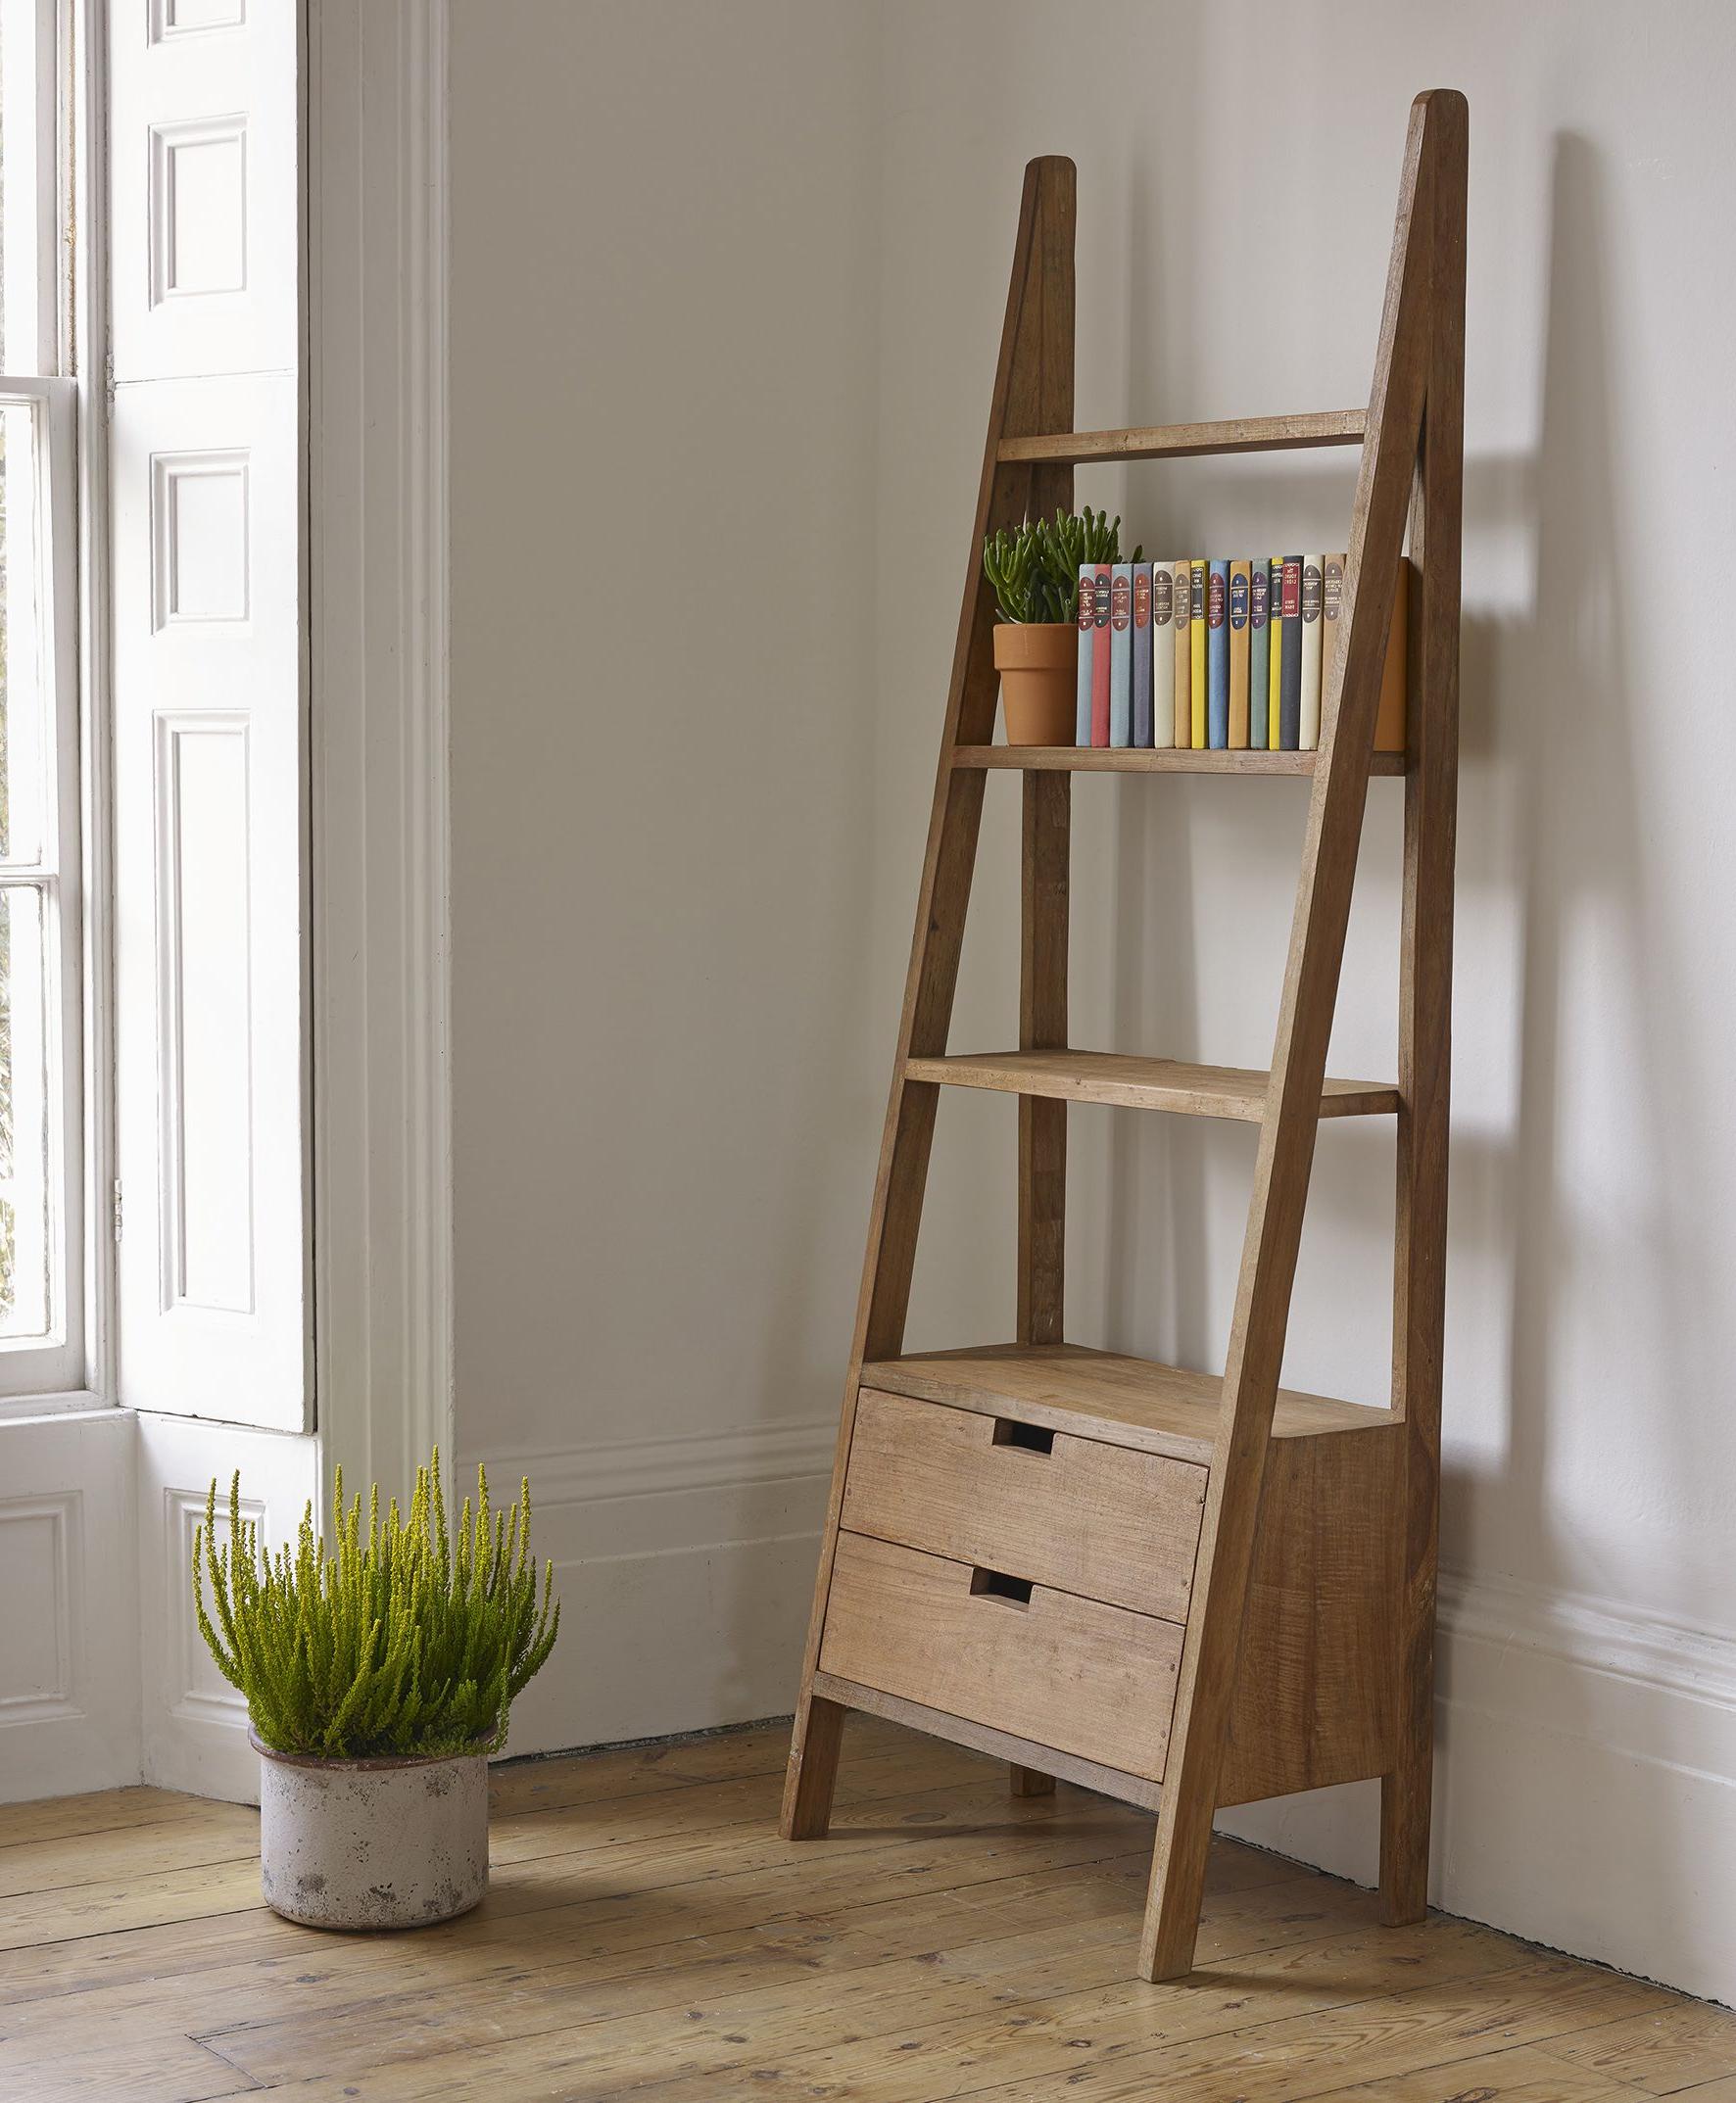 Fashionable Sumatra Teak Ladder Bookcase With Drawers (View 10 of 20)